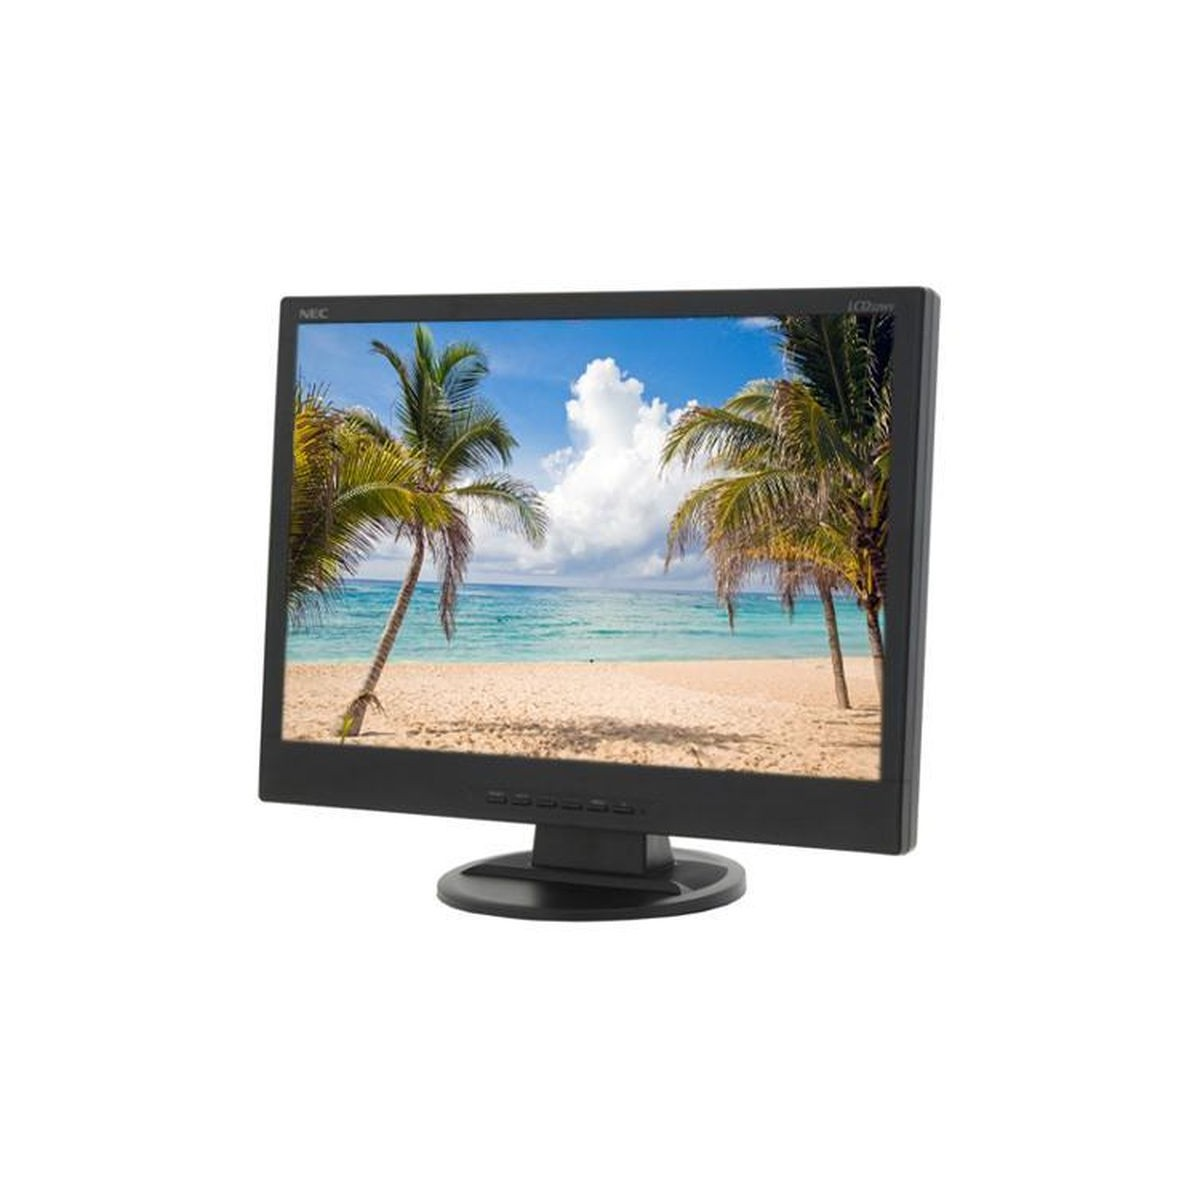 NEC AccuSync LCD22WV-BK TN LCD 22' VGA KL.A-